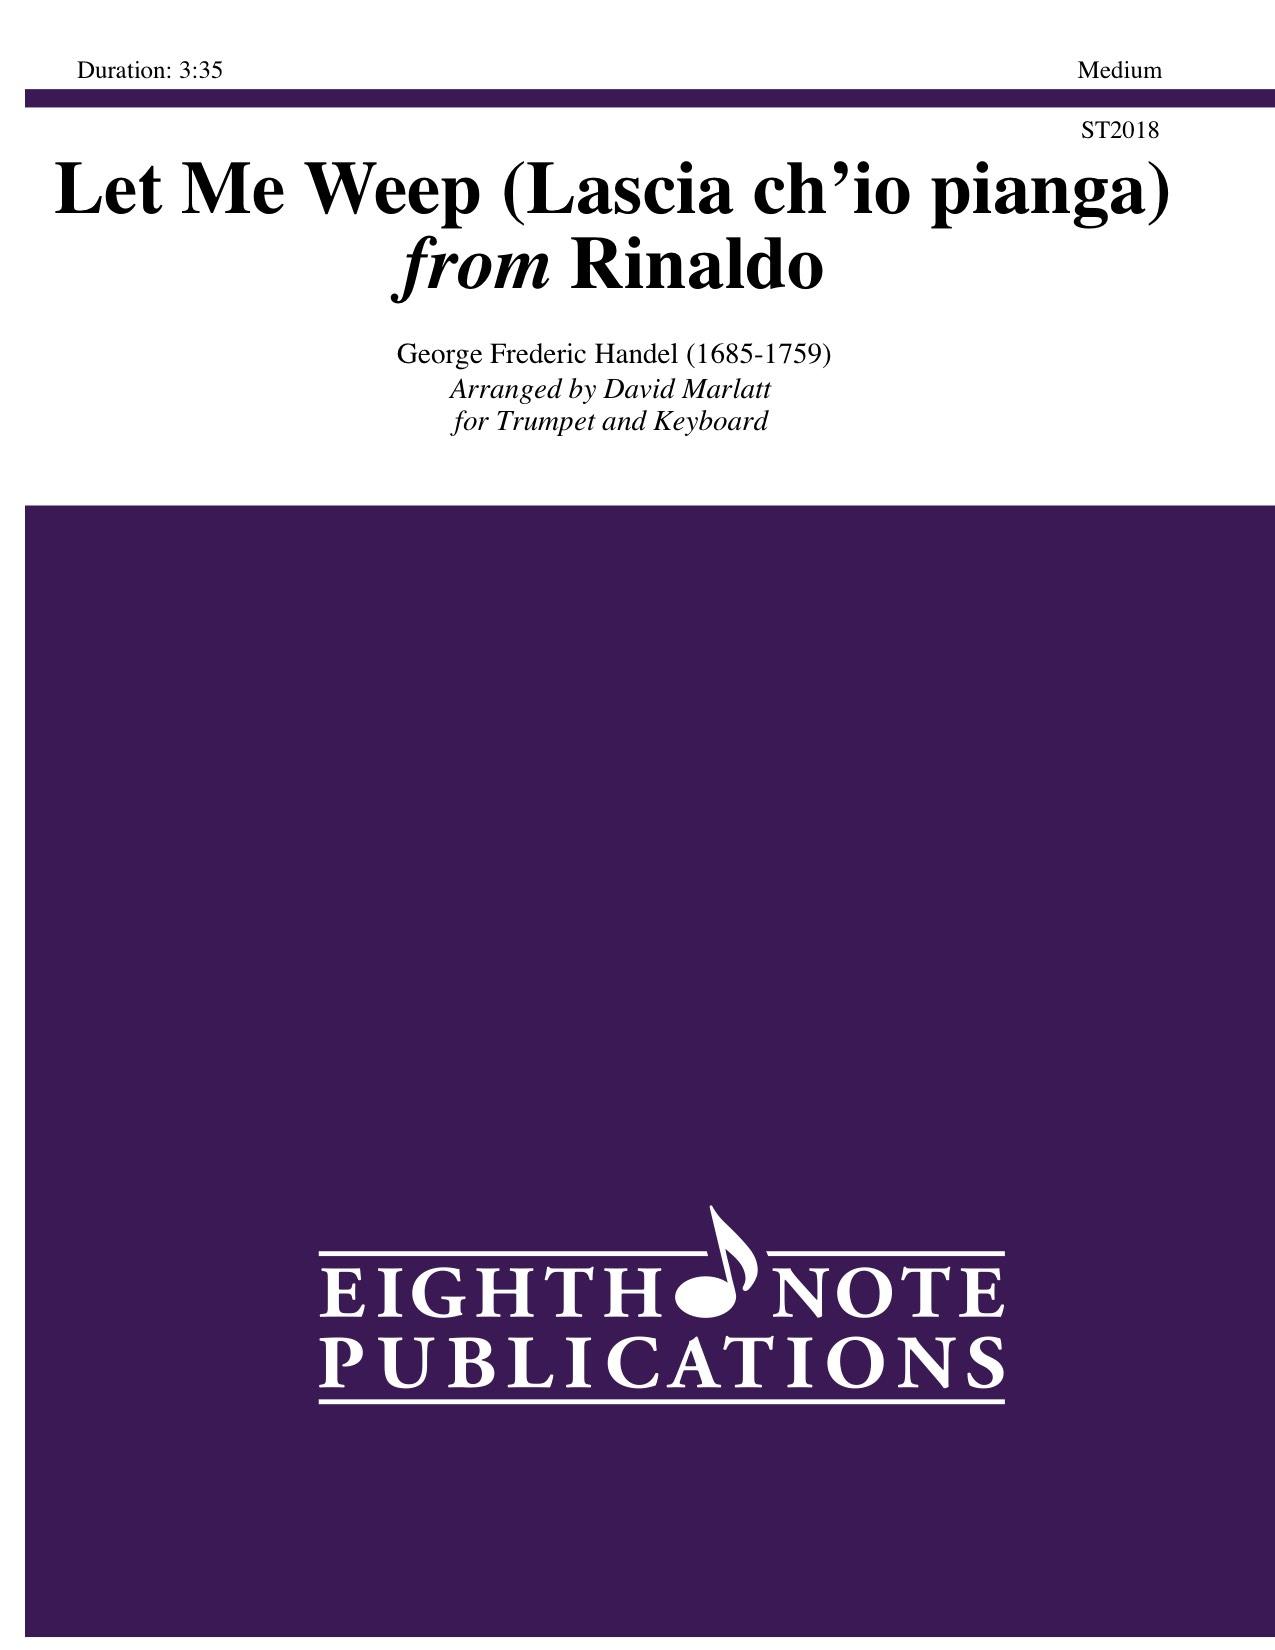 Let Me Weep (Lascia chio pianga) from Rinaldo - George Frederic Handel